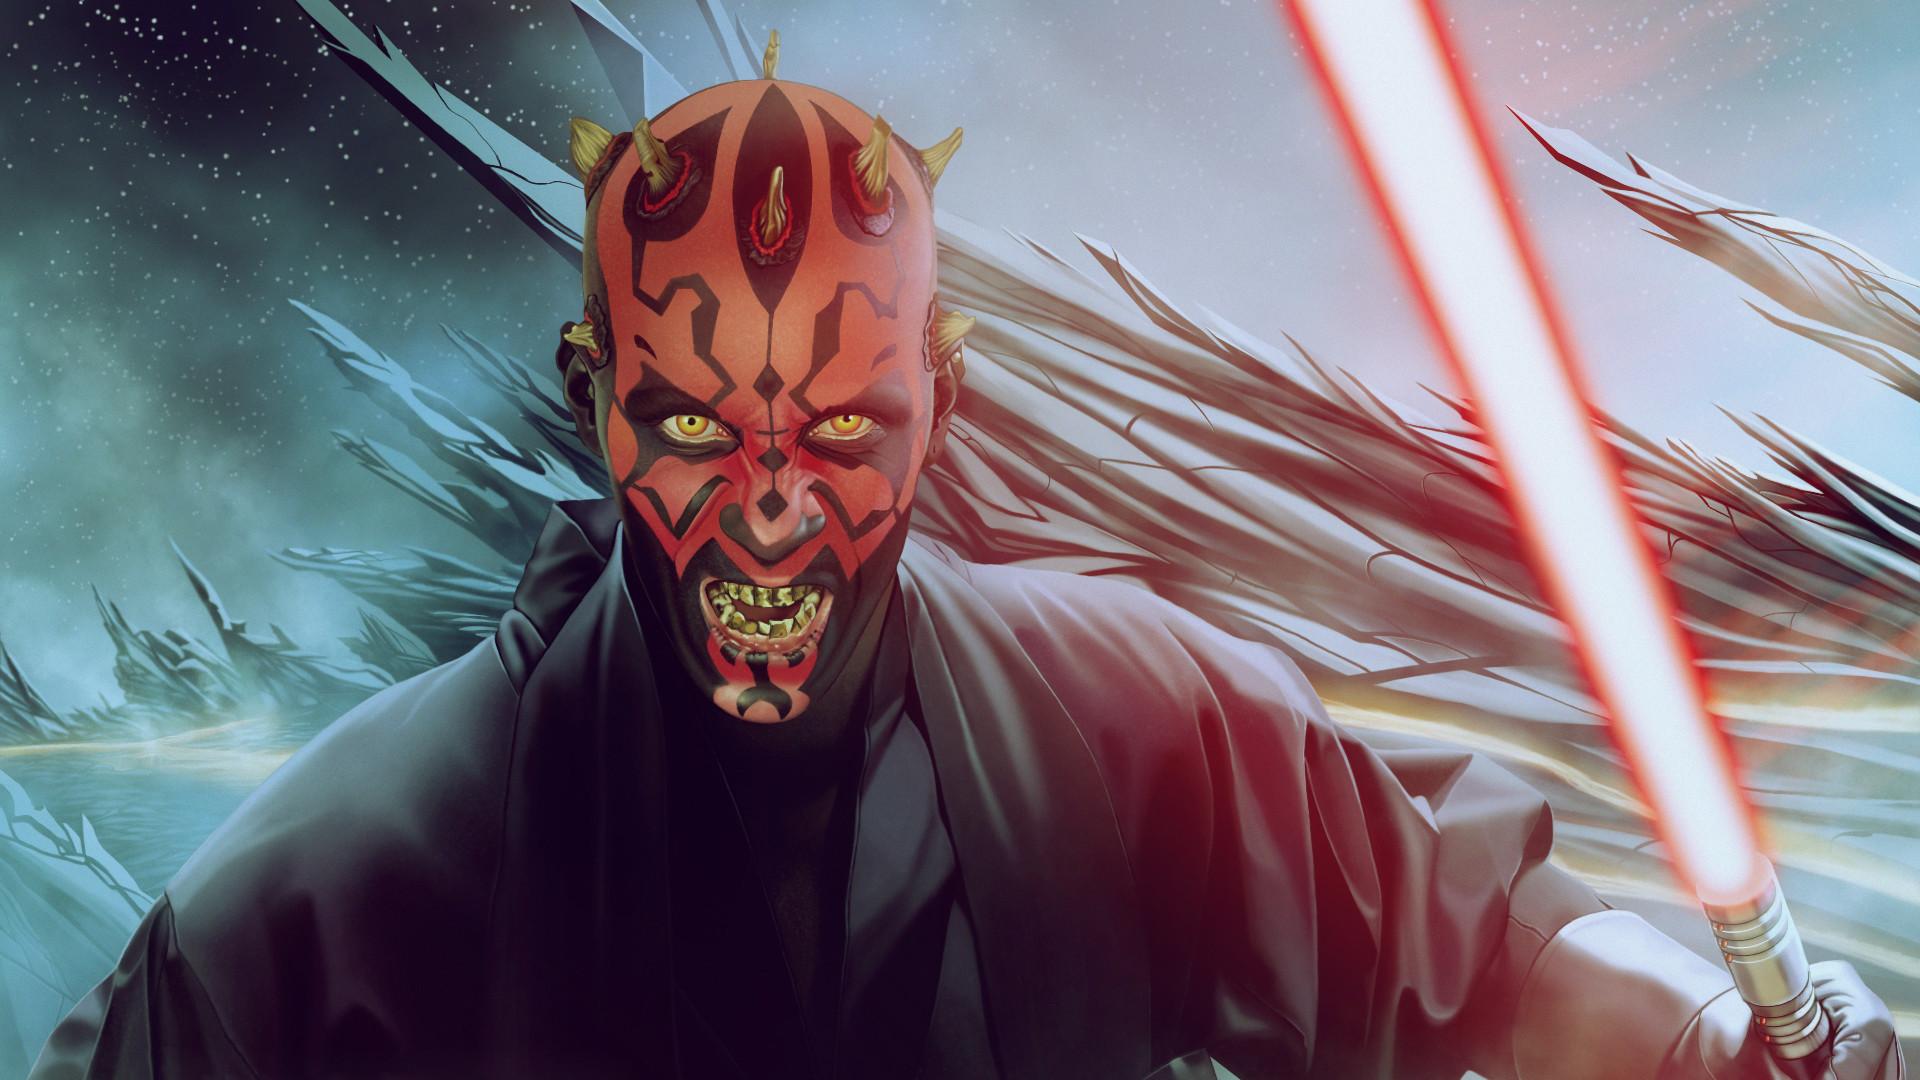 Sci Fi – Star Wars Darth Maul Lightsaber Wallpaper